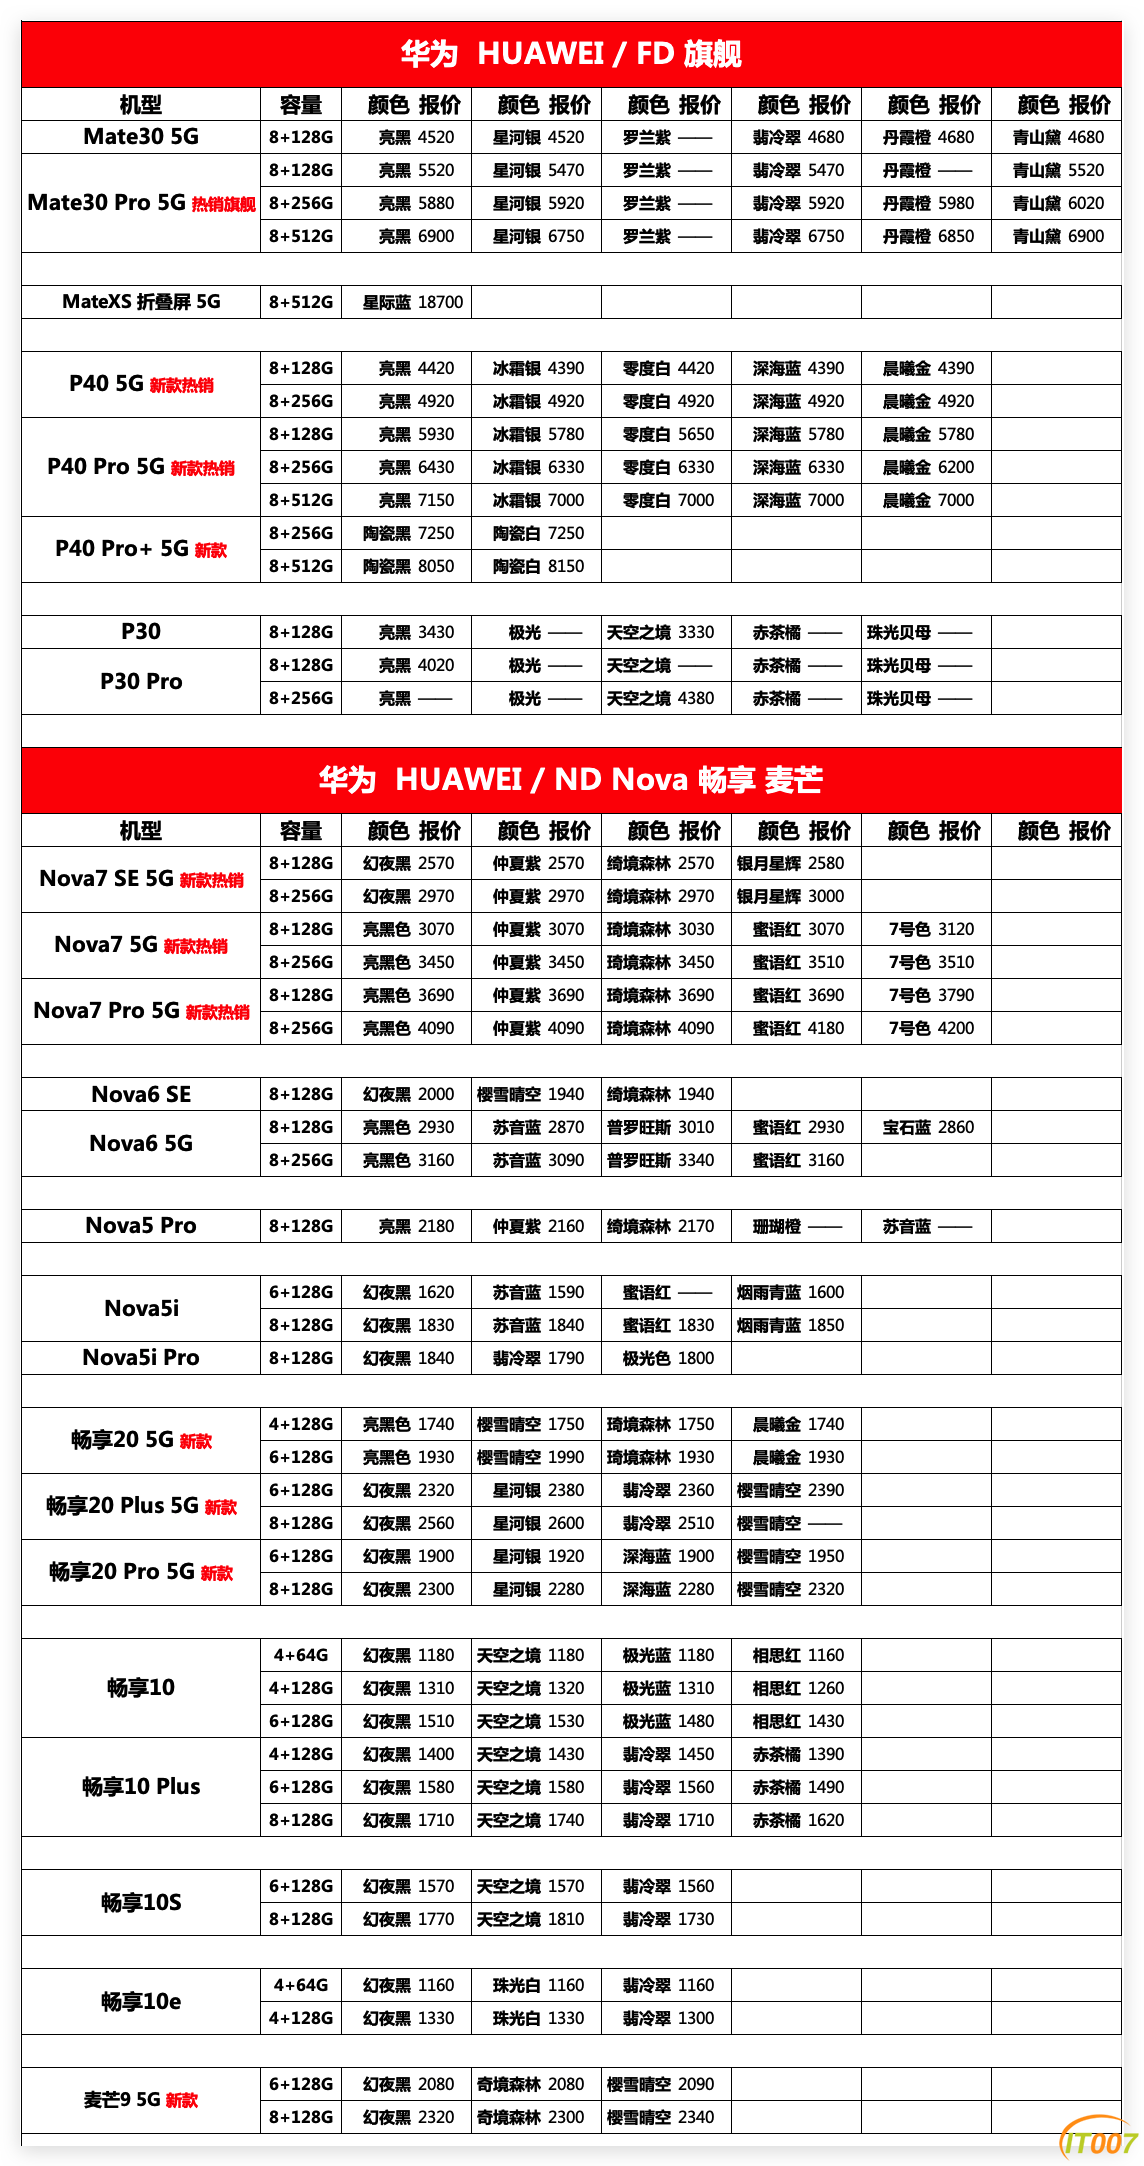 Xnip2020-09-25_14-08-15.png